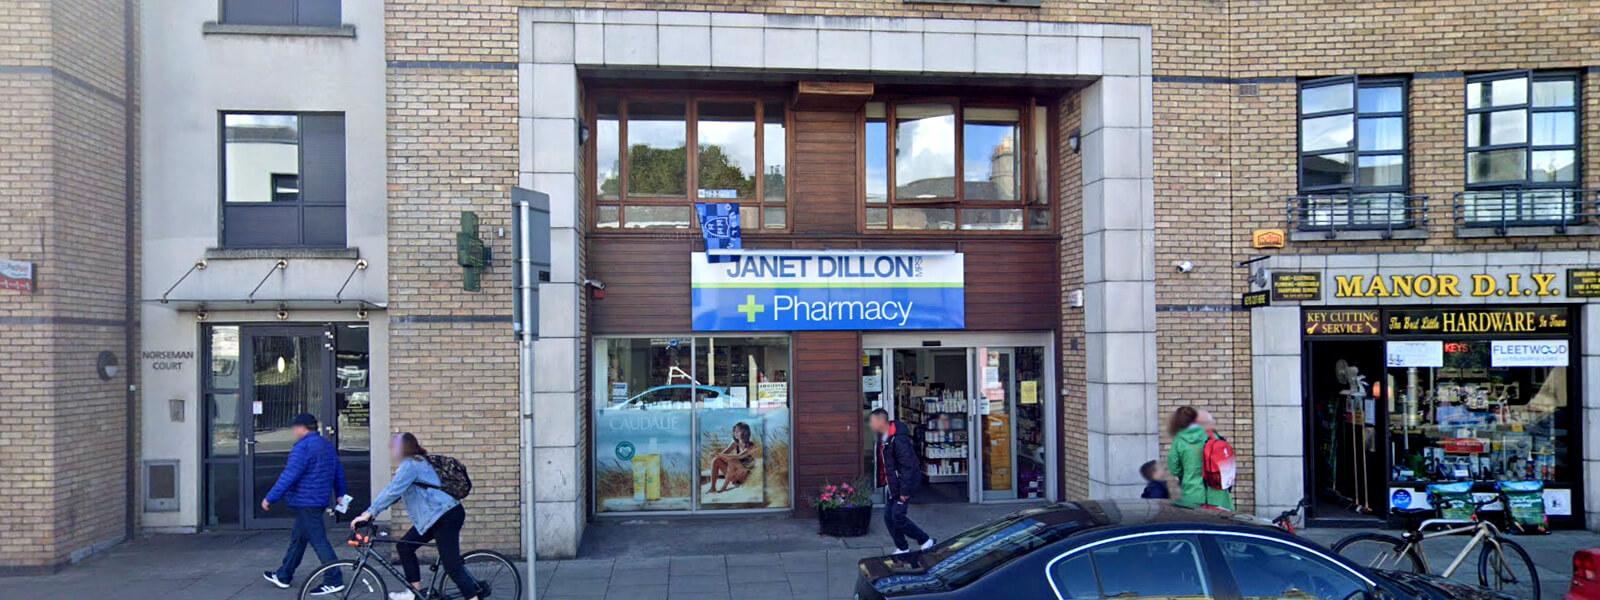 Janet Dillon Pharmacy